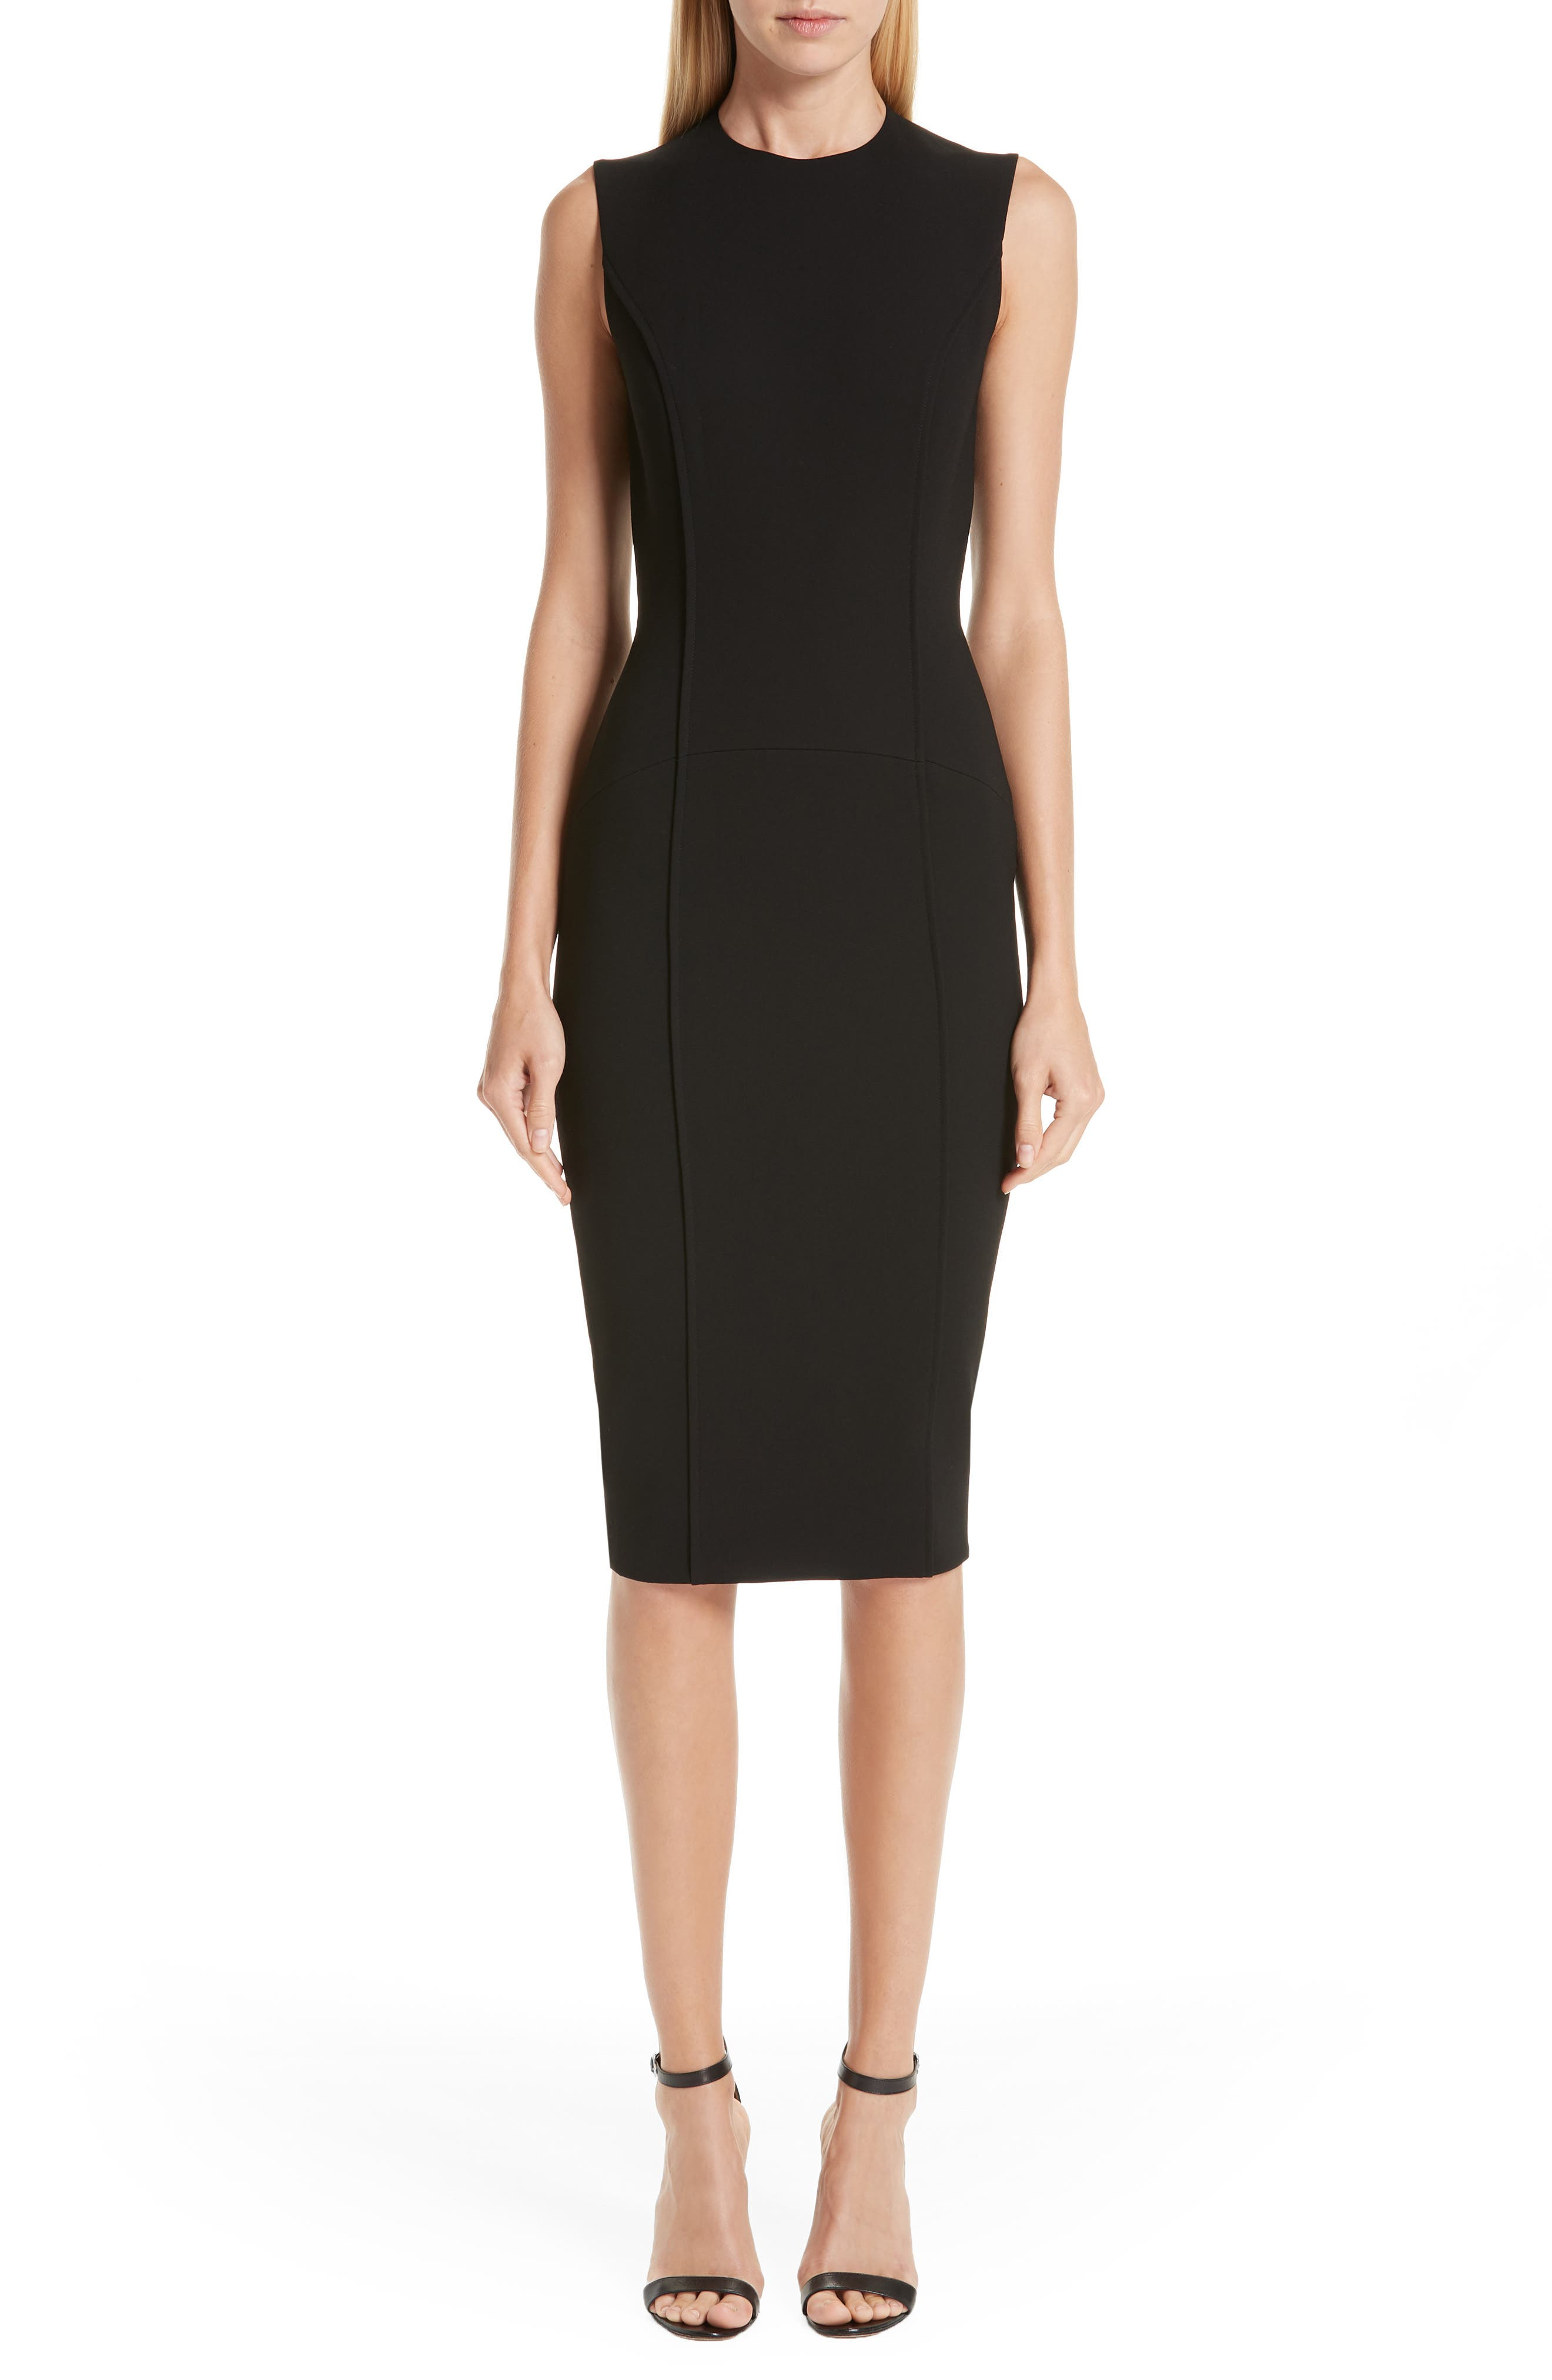 VICTORIA BECKHAM, Back Zip Body-Con Dress, Main thumbnail 1, color, BLACK